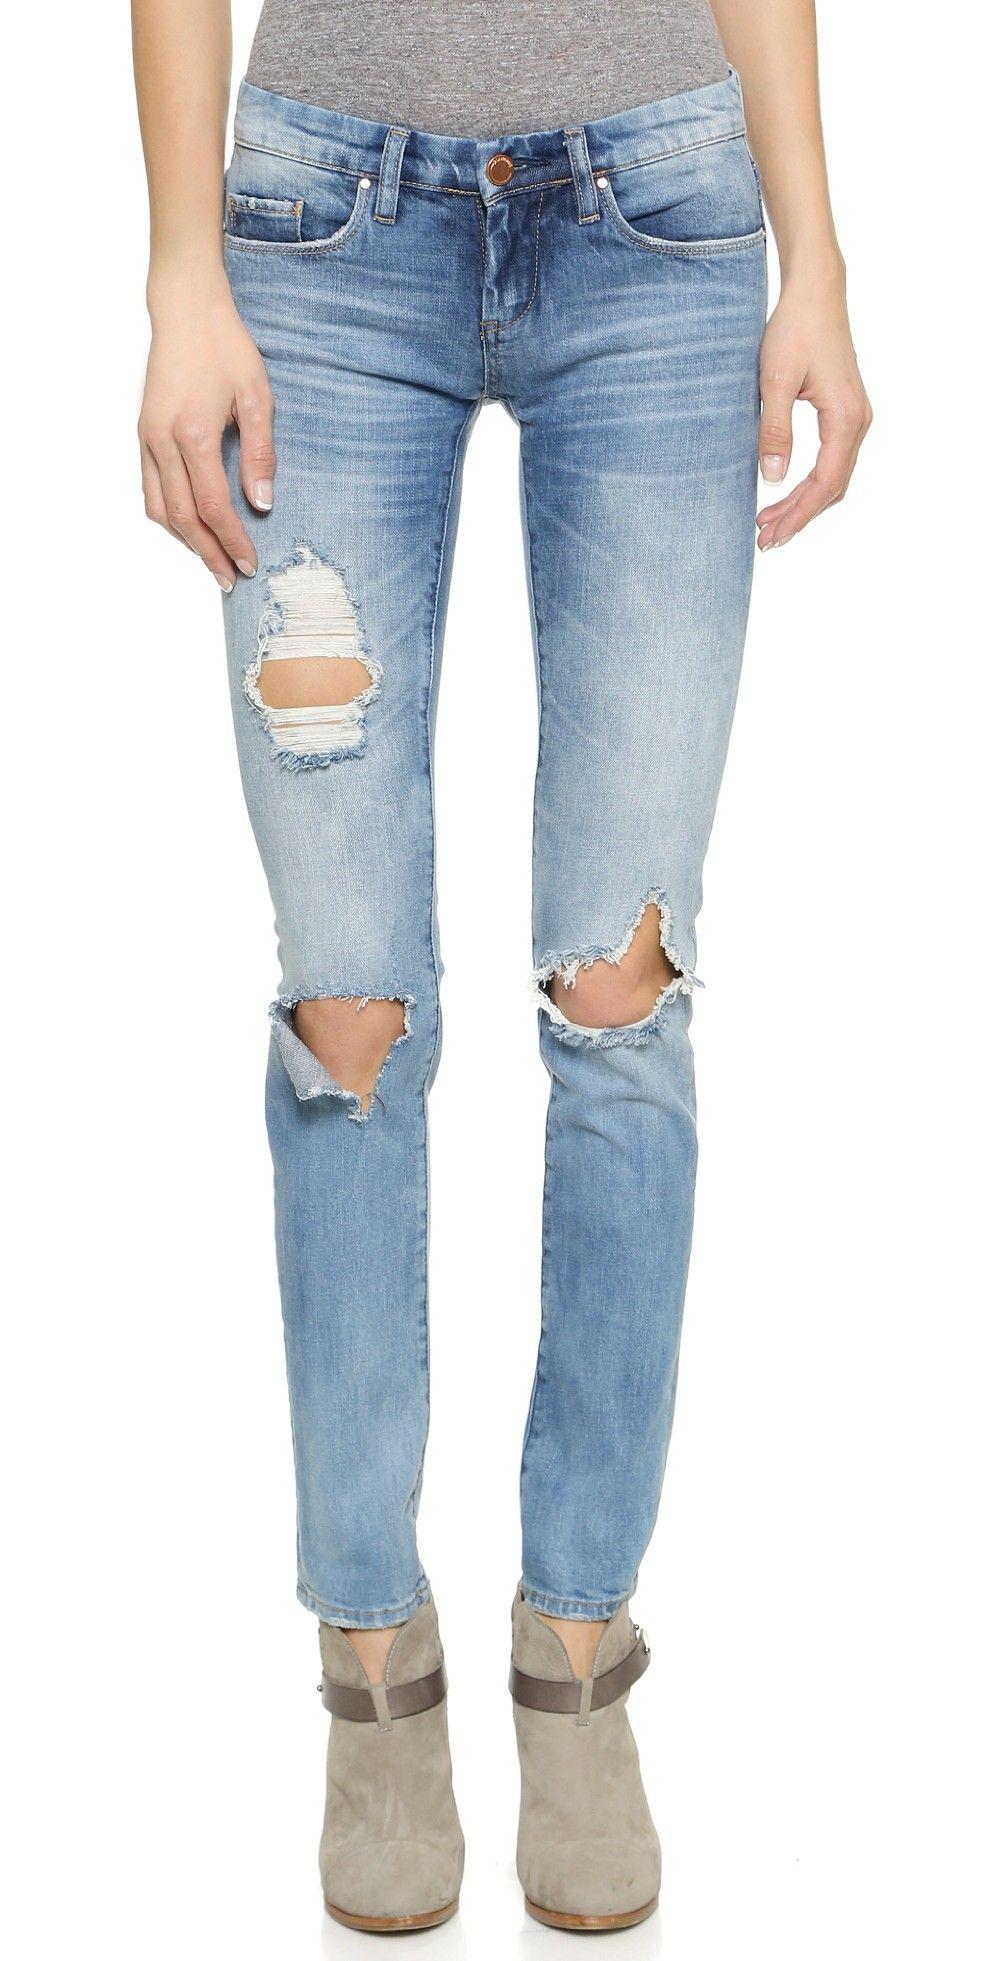 2e044c44e677 Distressed Skinny Jeans | Stylish @me | Distressed skinny jeans ...